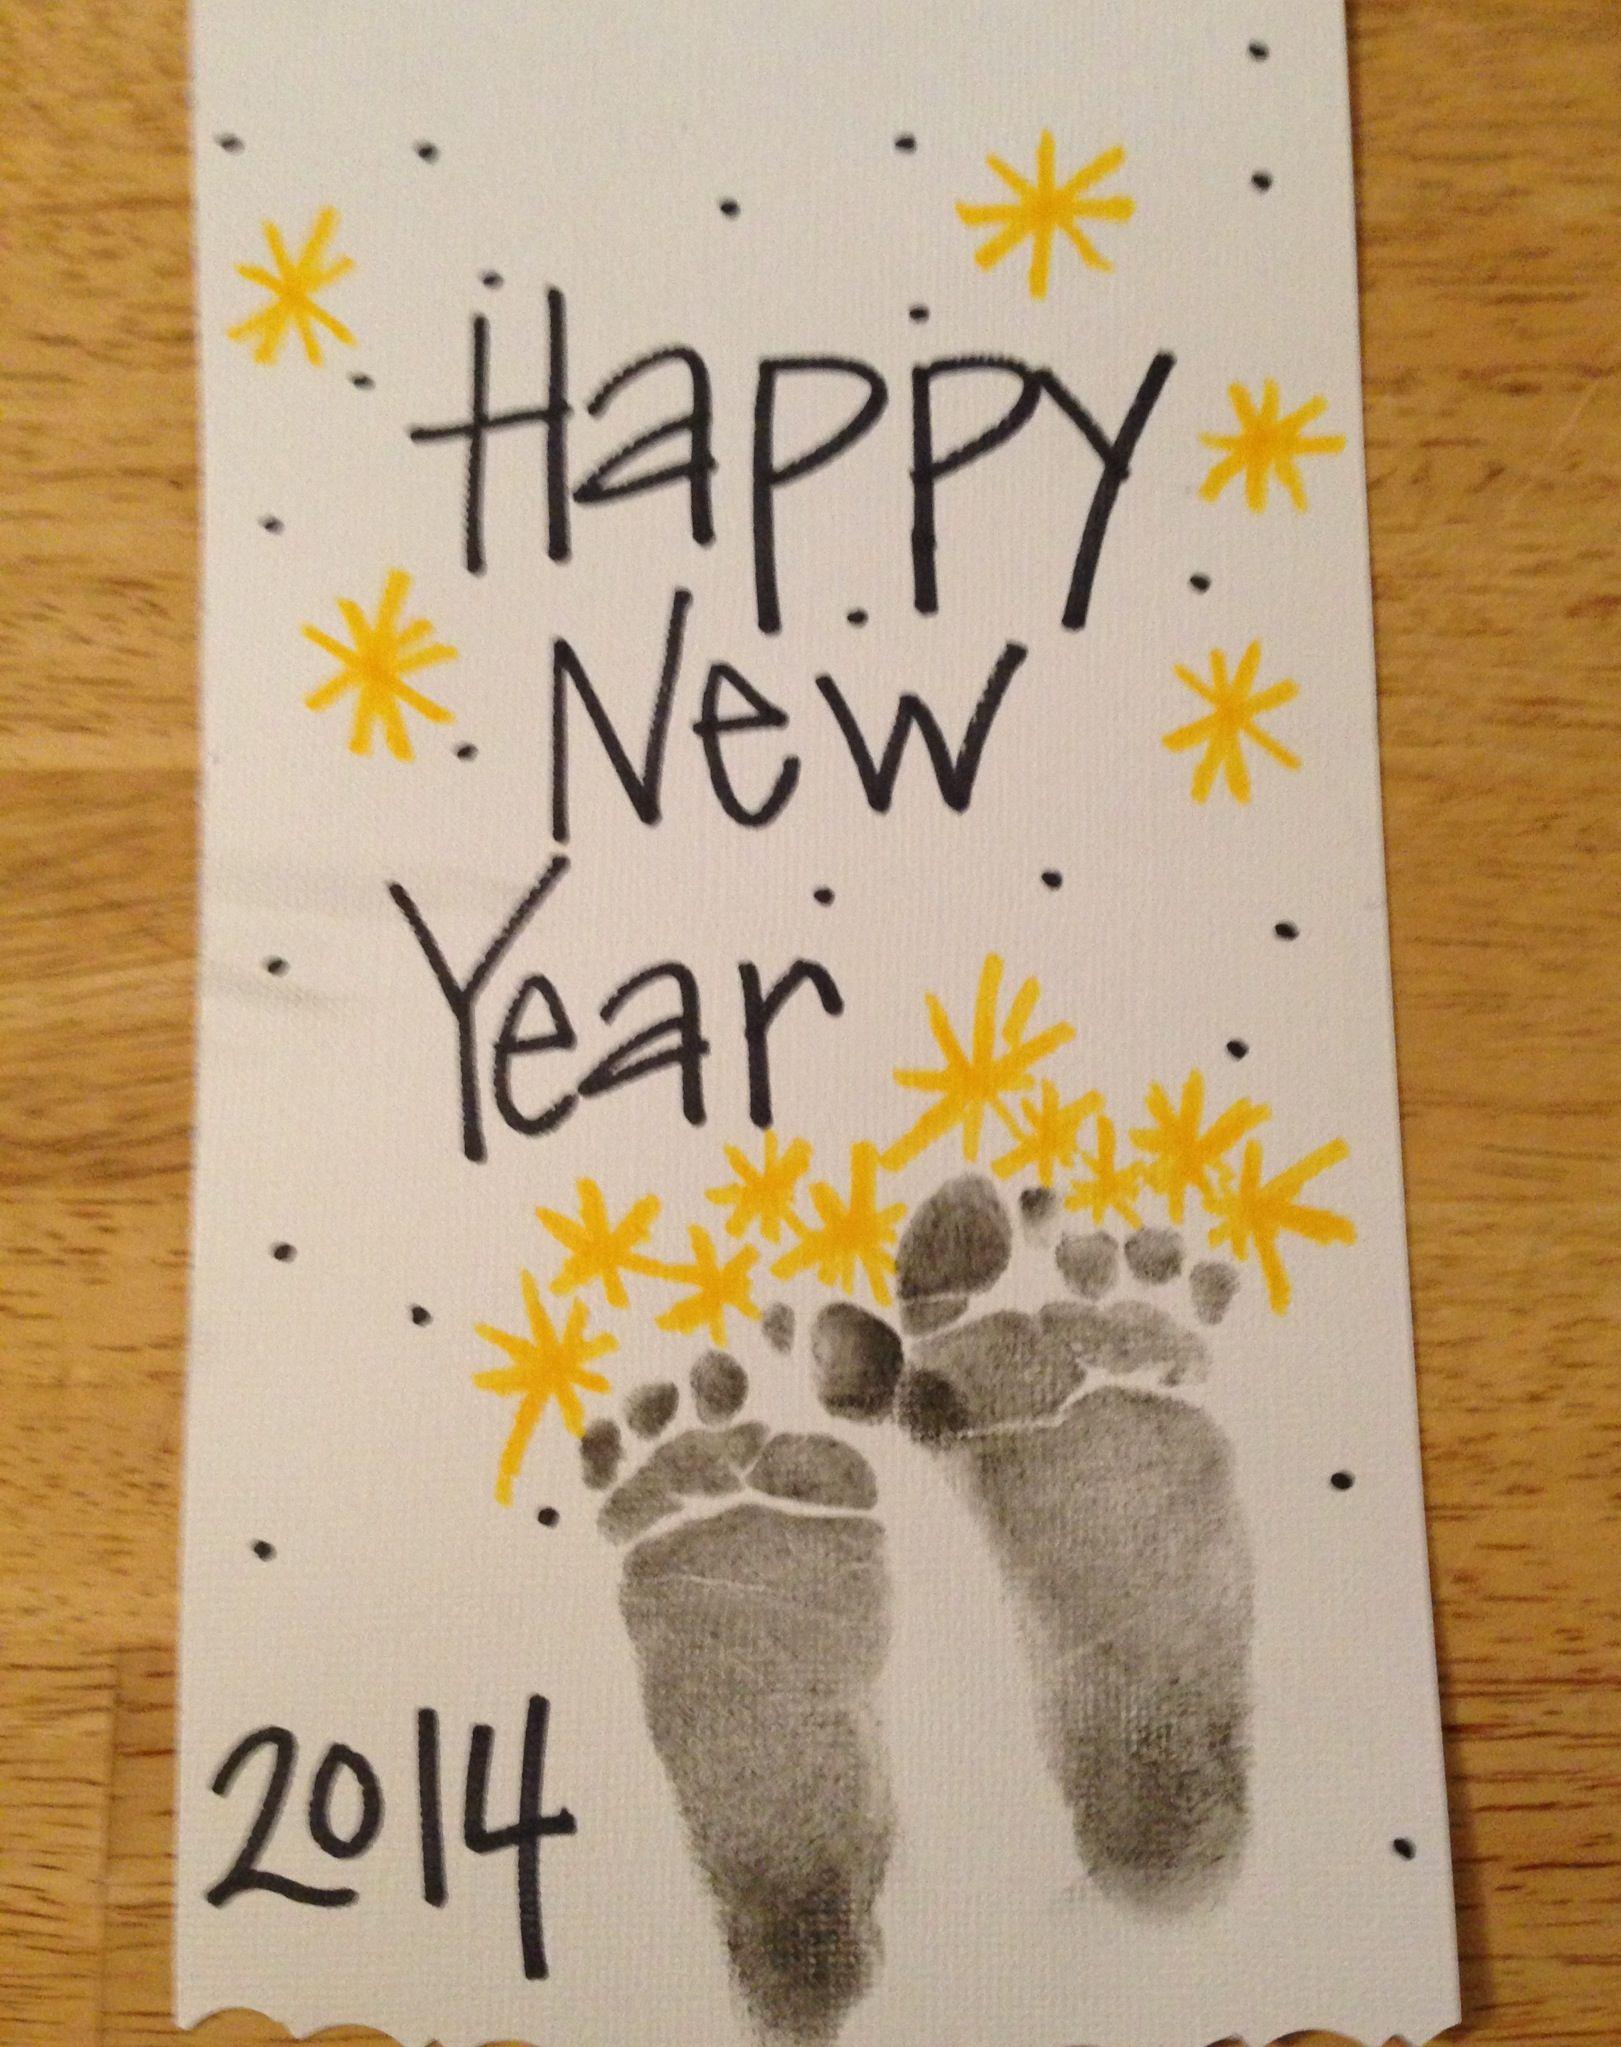 New Year Footprints Fireworks Daycare Crafts Preschool